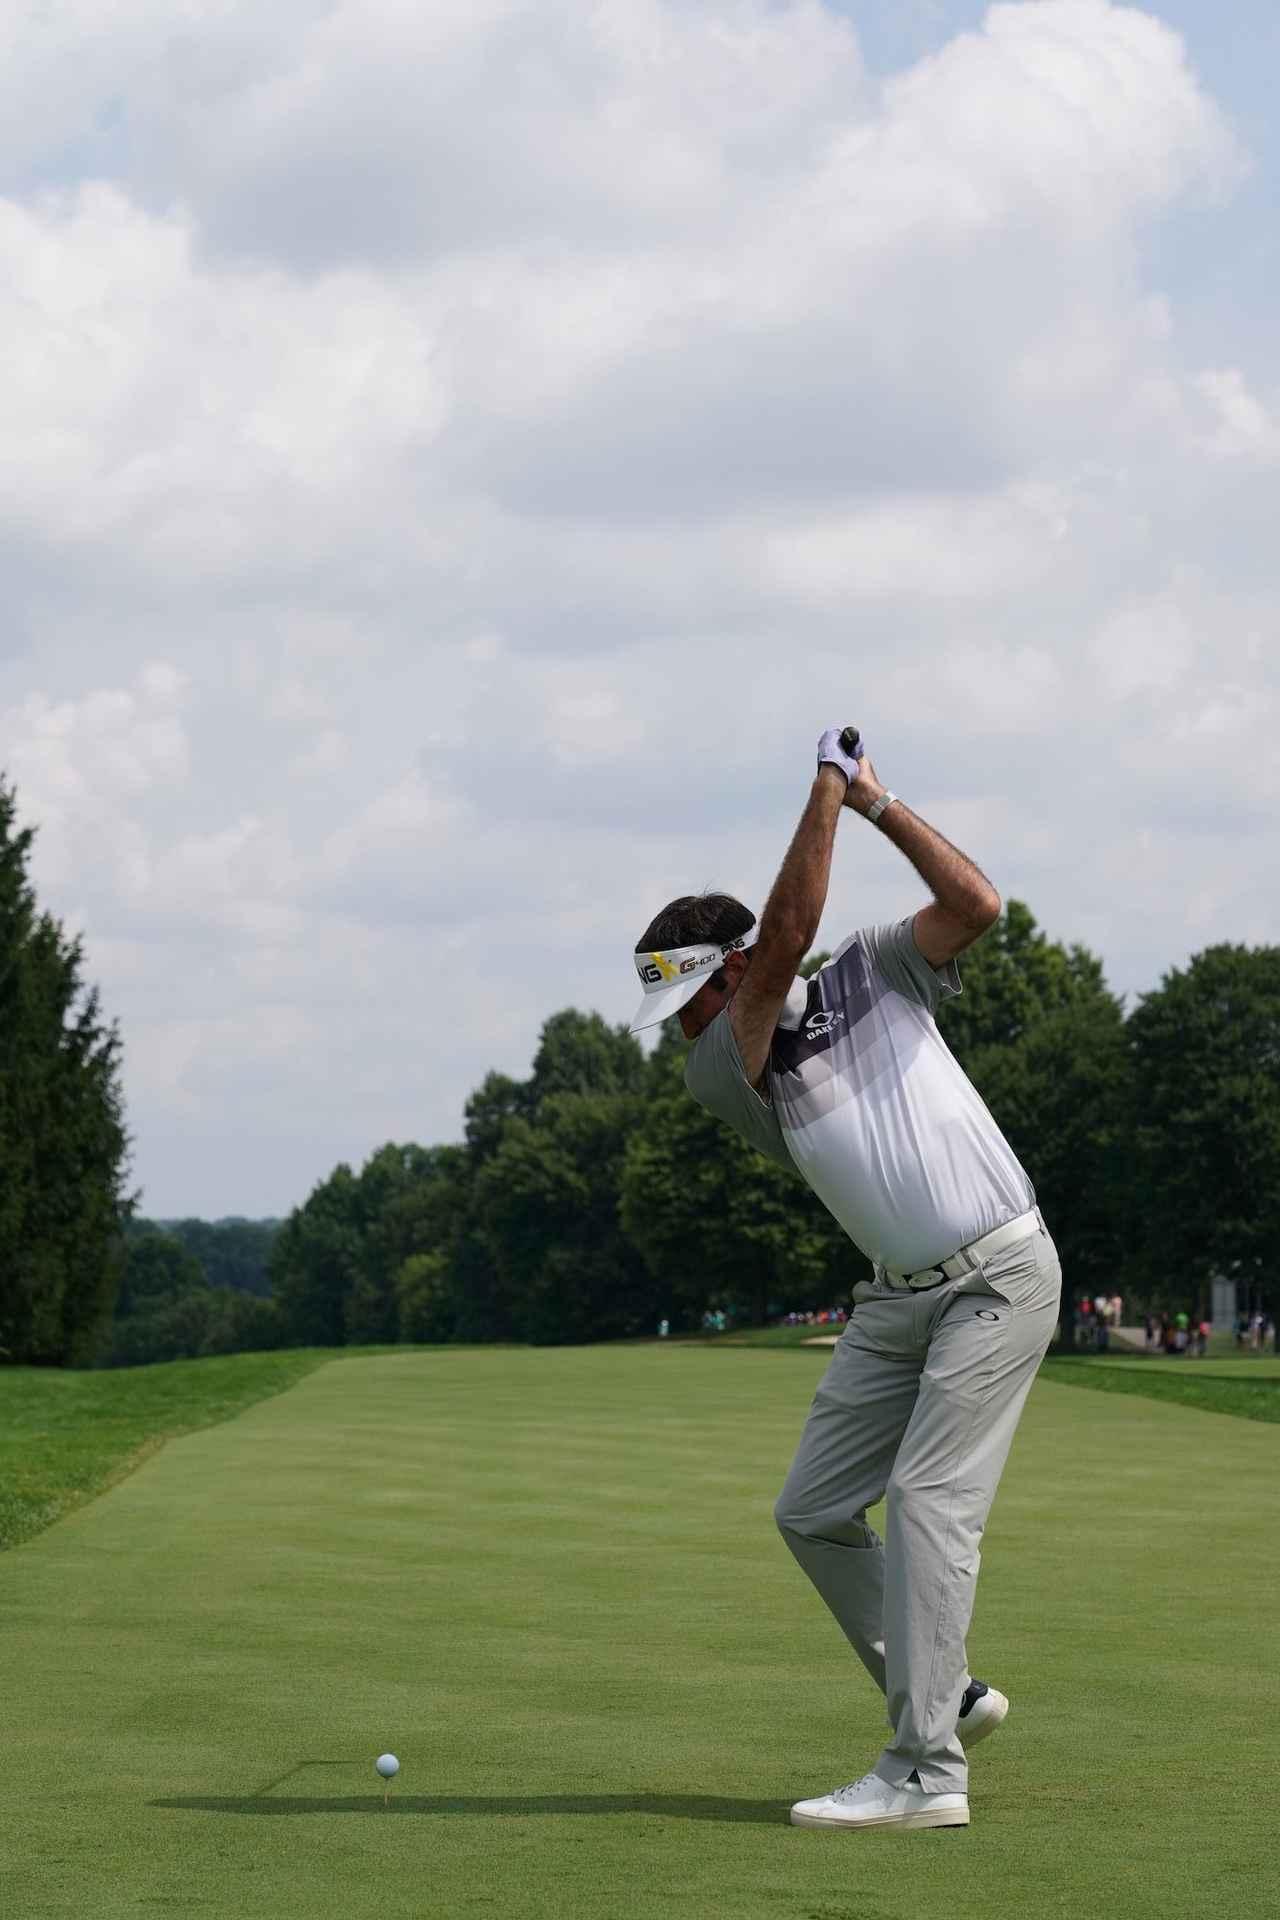 Images : 11番目の画像 - 強烈! バッバ・ワトソンのドライバーショット - みんなのゴルフダイジェスト